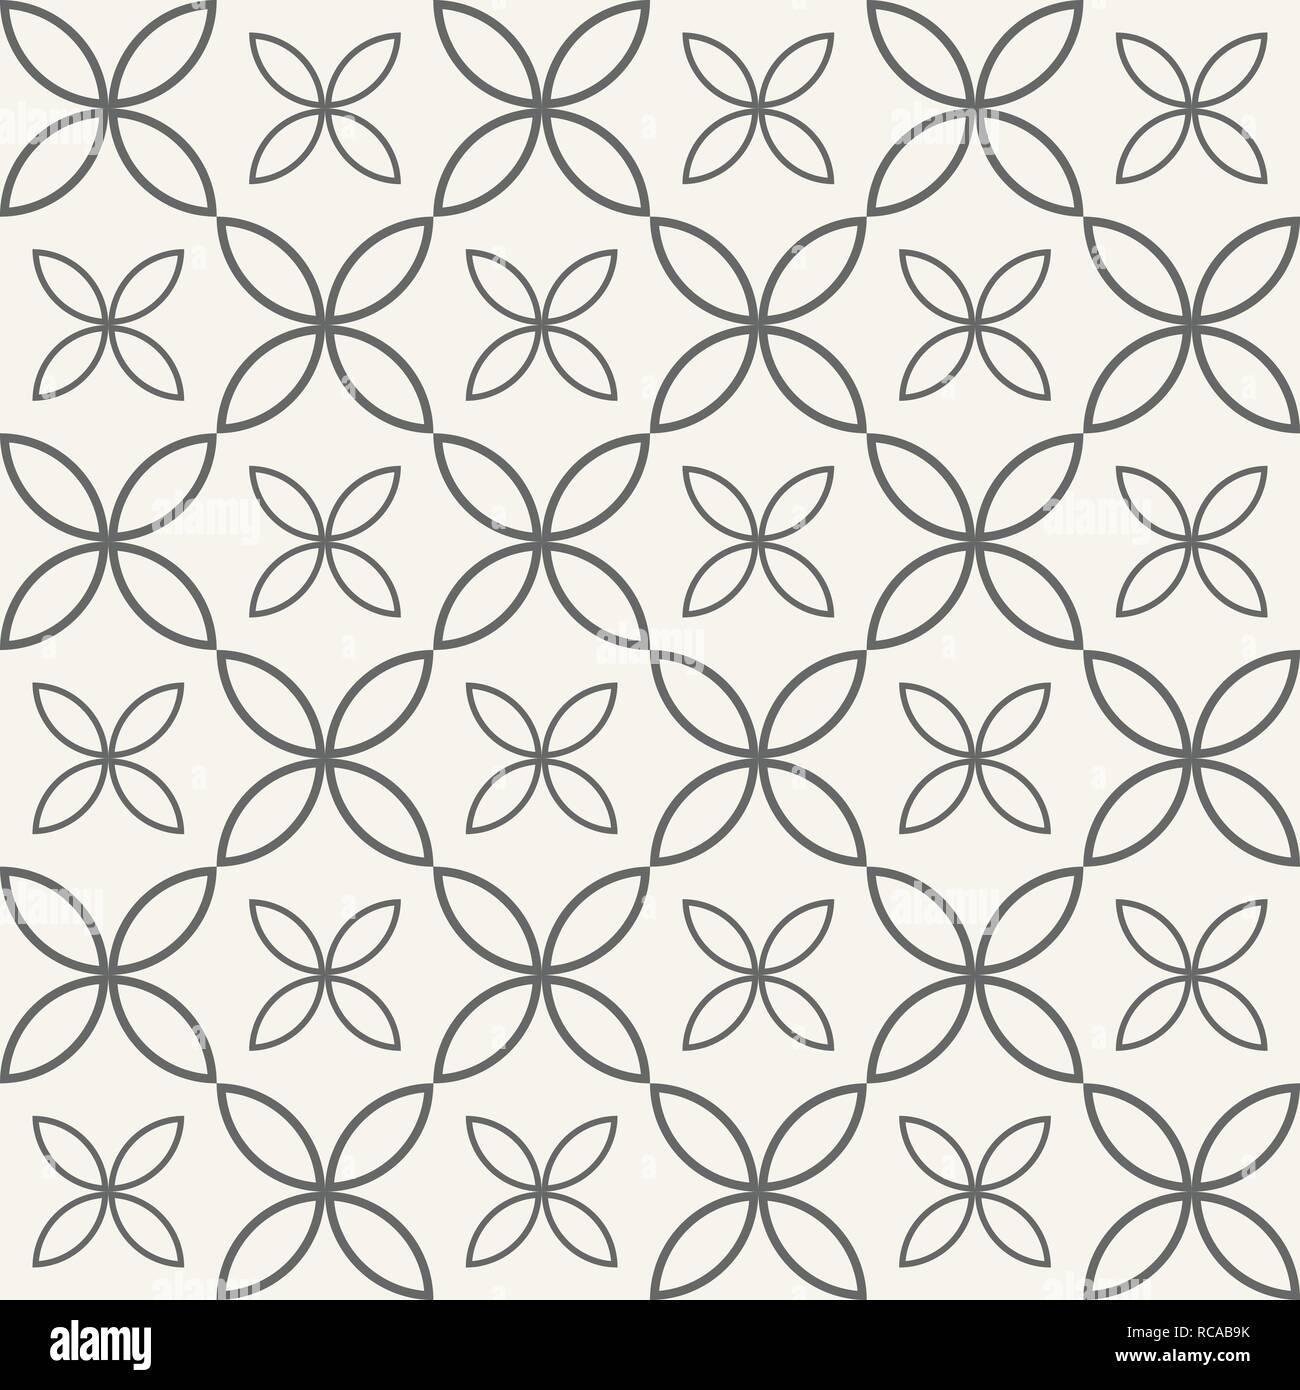 Abstract Seamless Ornamental Quatrefoil Pattern Vector Geometric